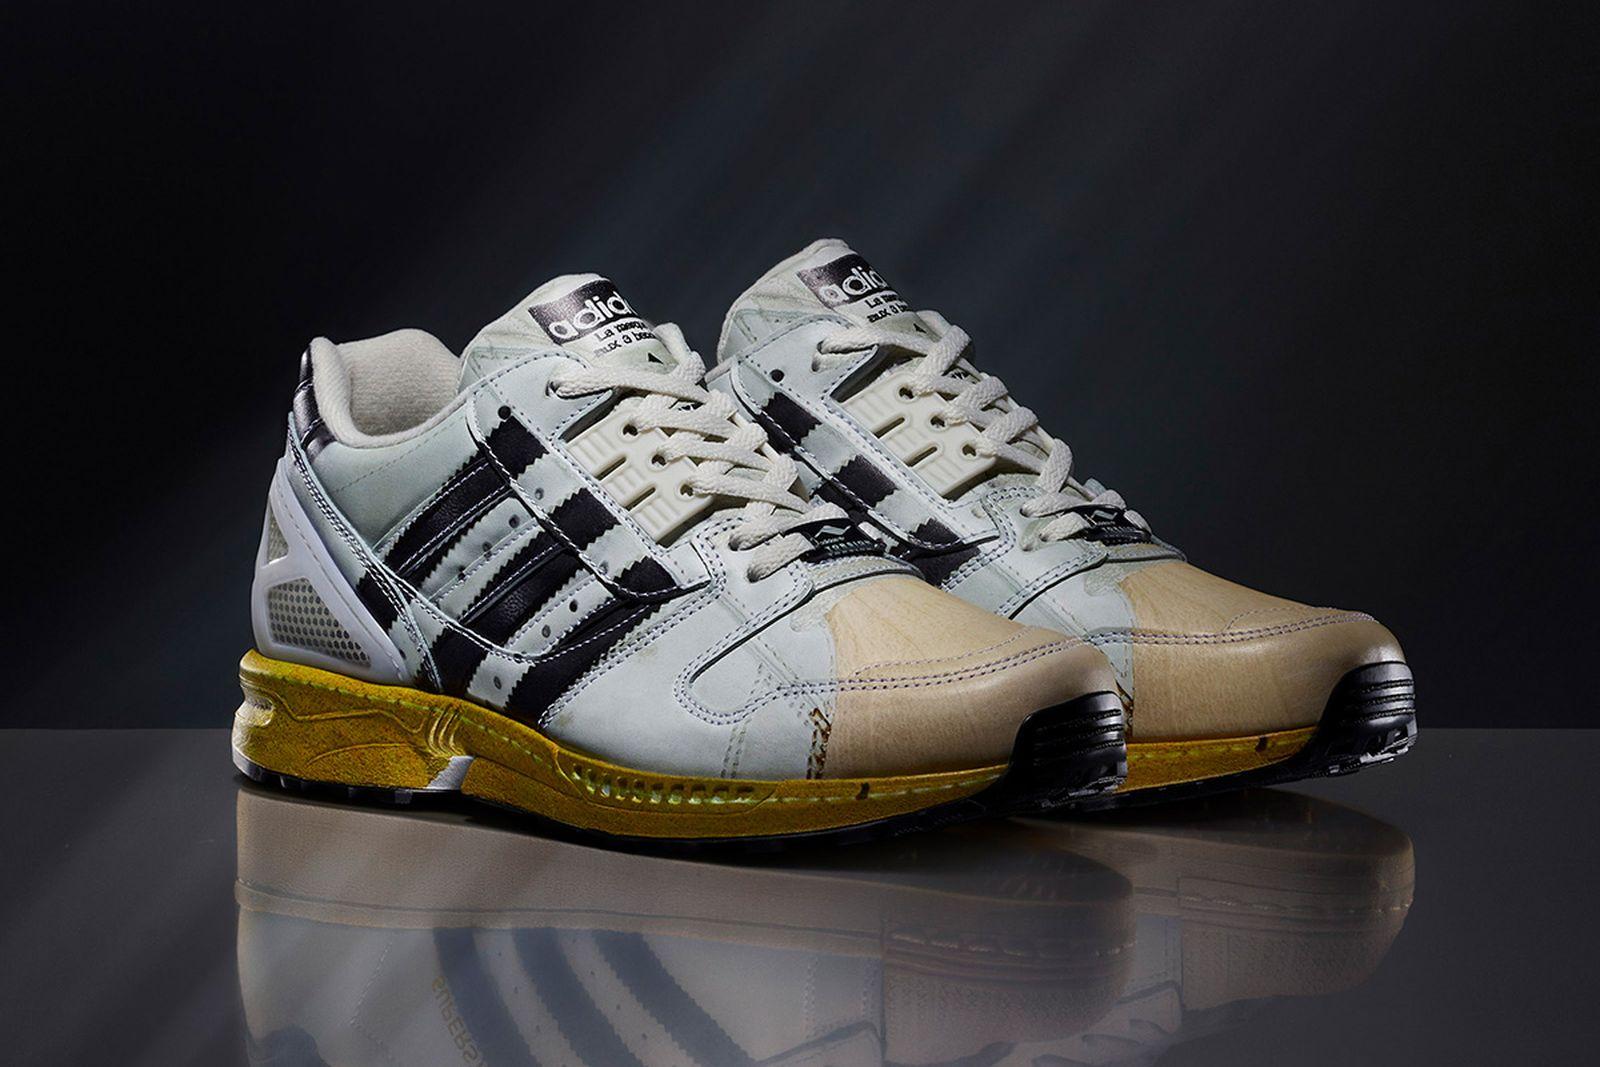 adidas-zx-8000-superstar-release-date-price-03